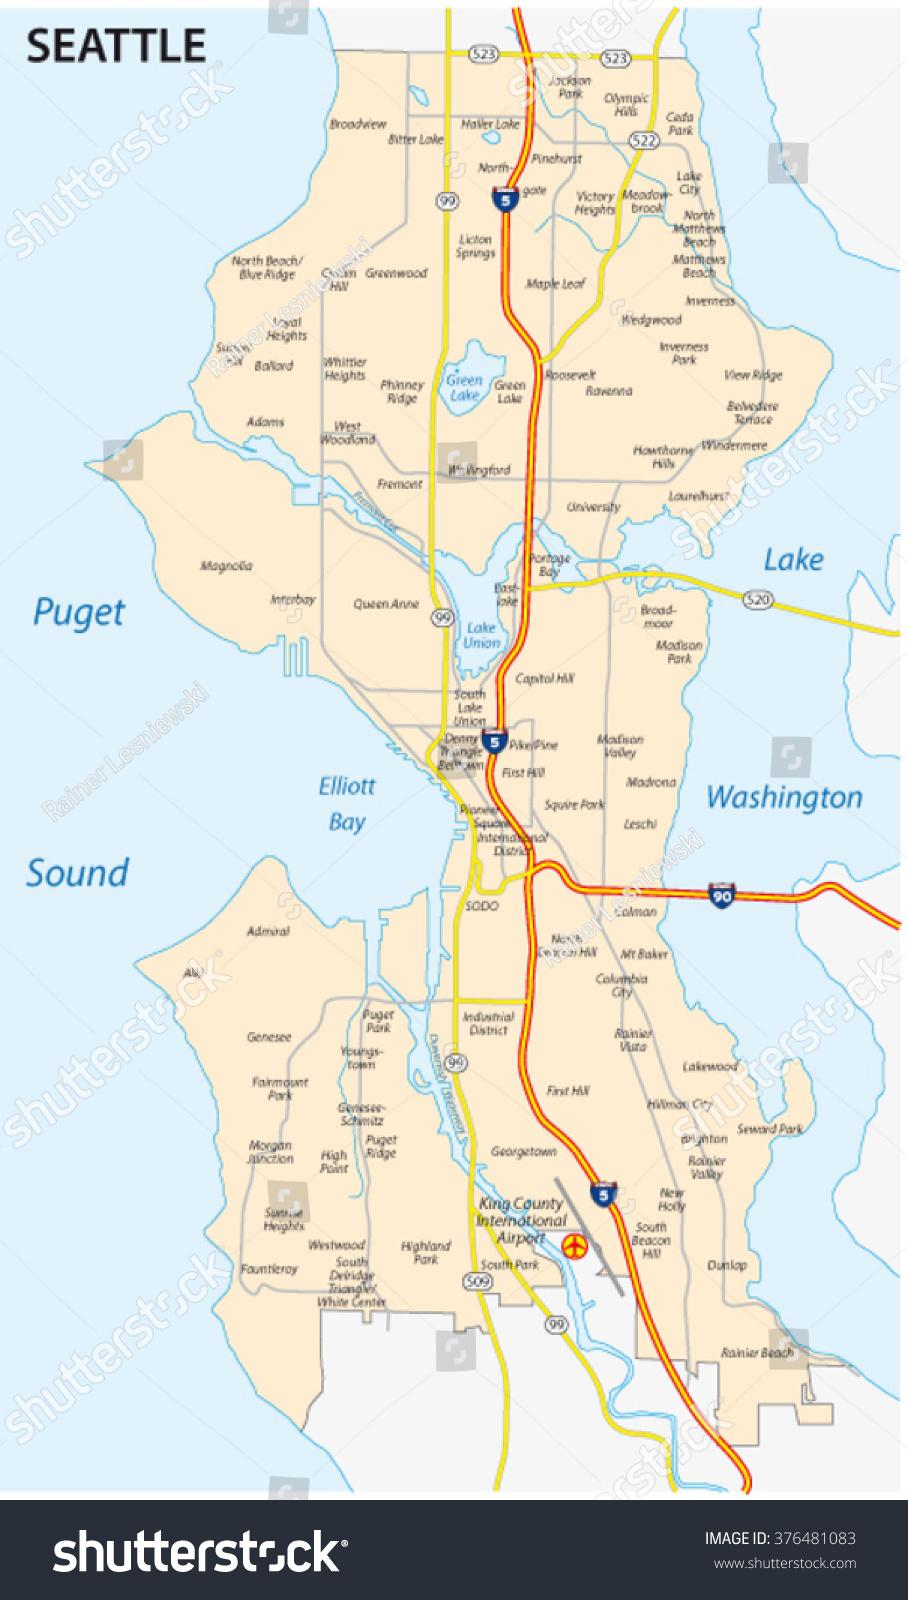 Seattle Road Neighborhood Map Stock Vector 376481083 Shutterstock